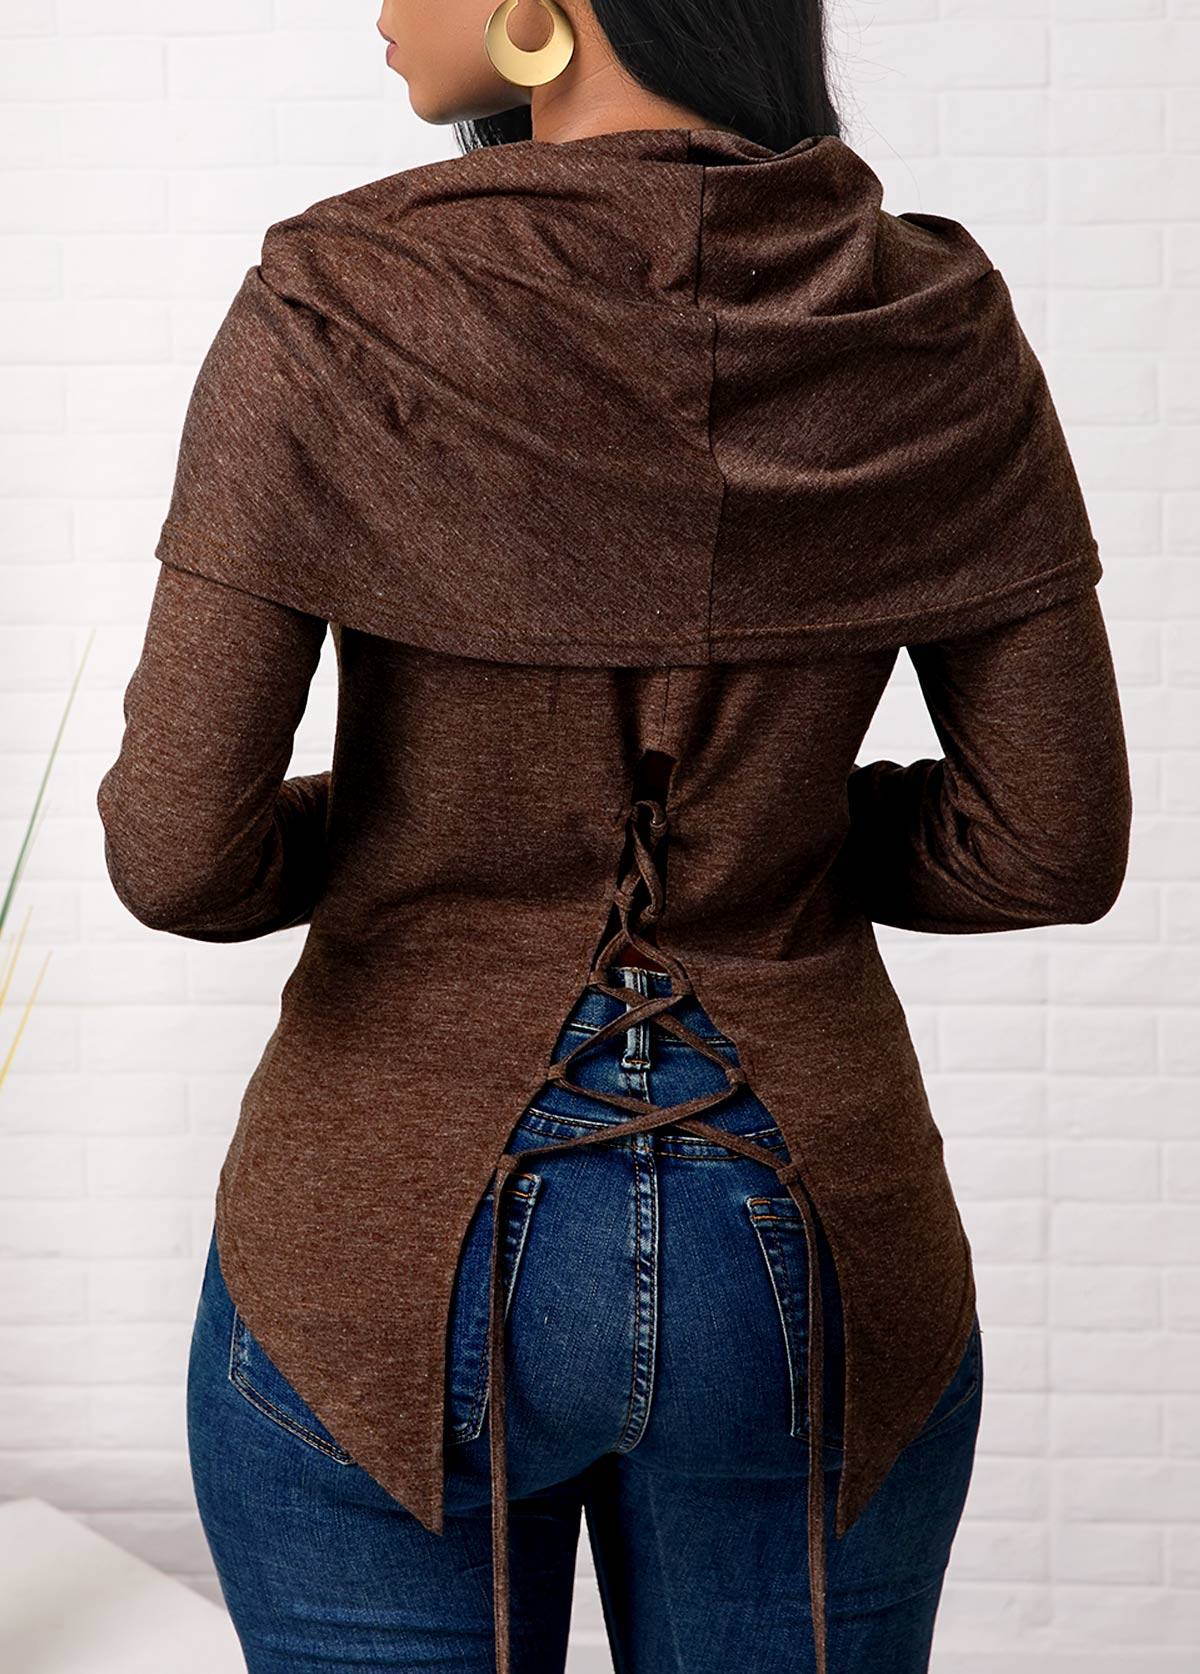 Lace Up Back Long Sleeve Brown Sweatshirt